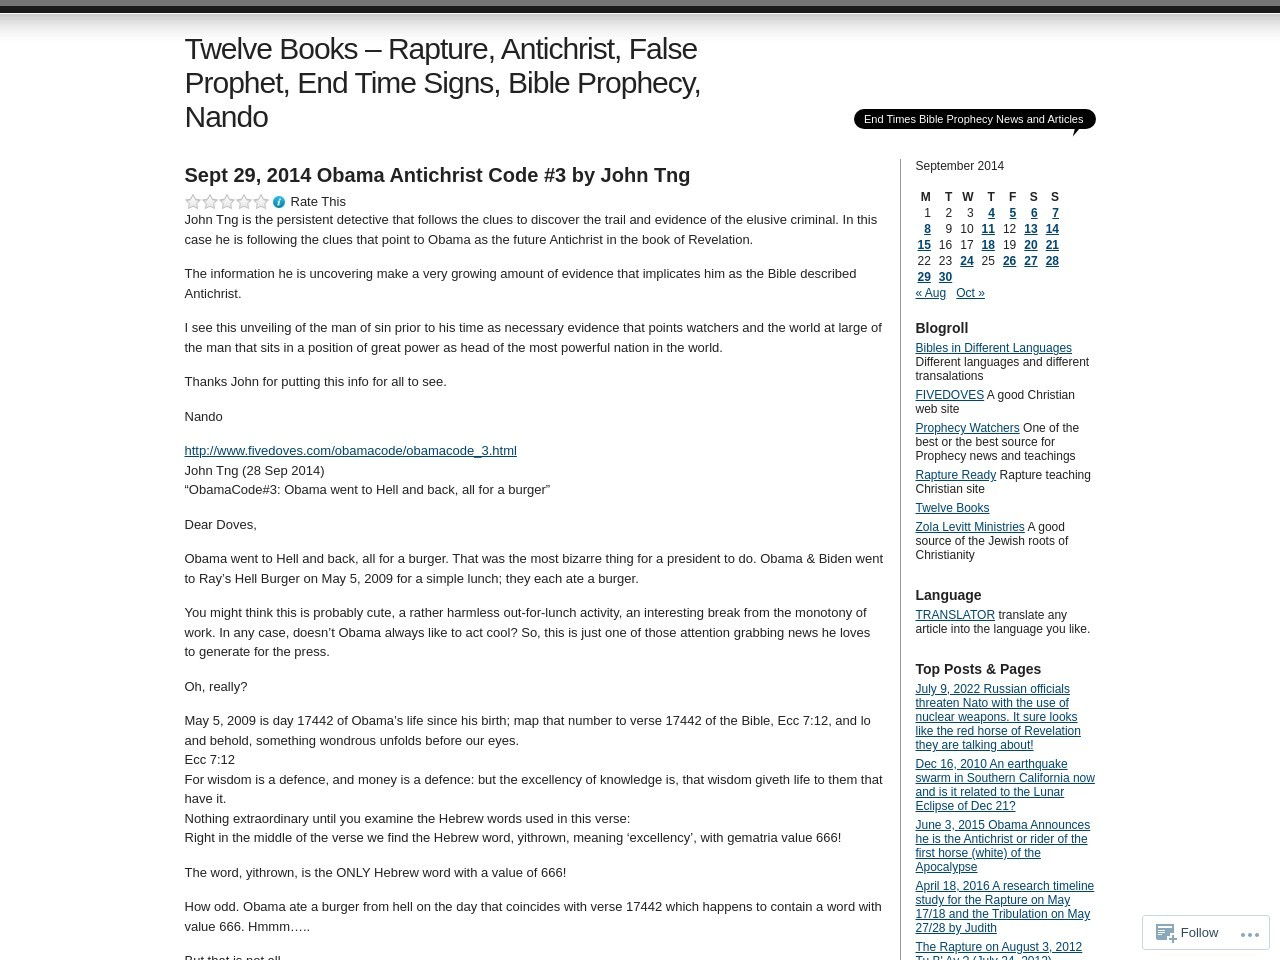 Sept 29, 2014 Obama Antichrist Code #3 by John Tng …